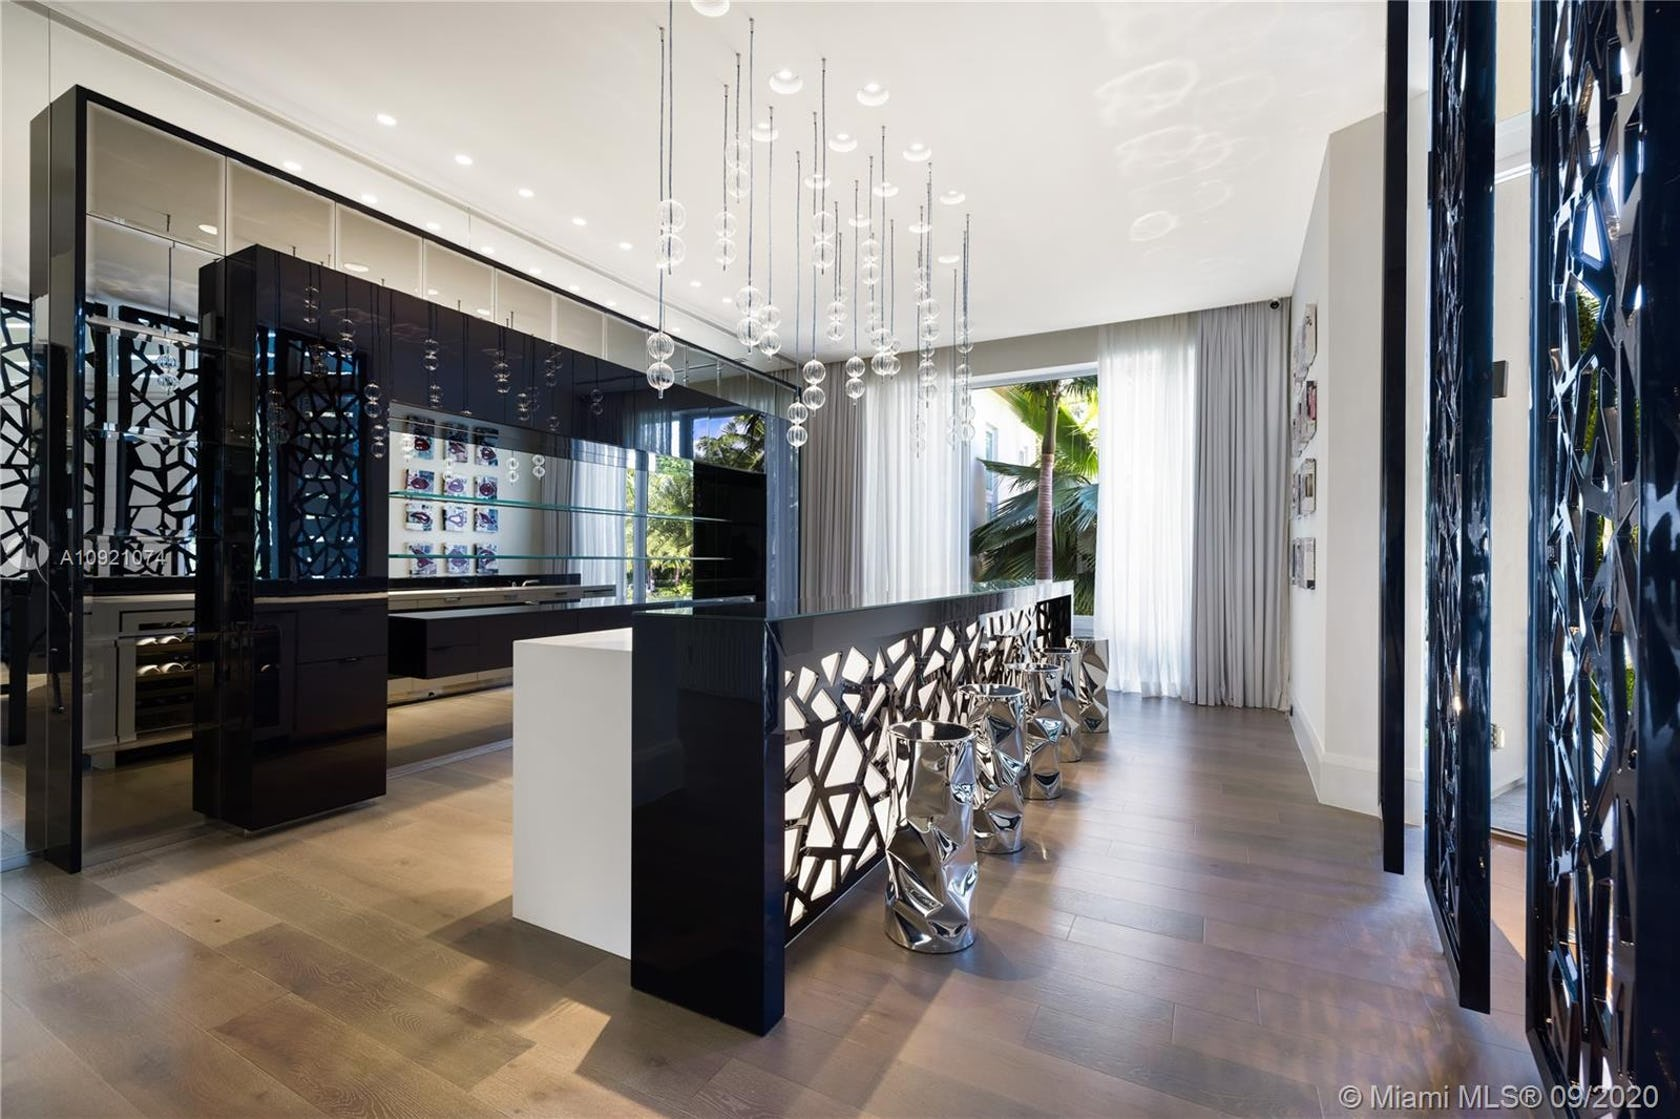 furniture lobby room indoors interior design floor flooring table reception